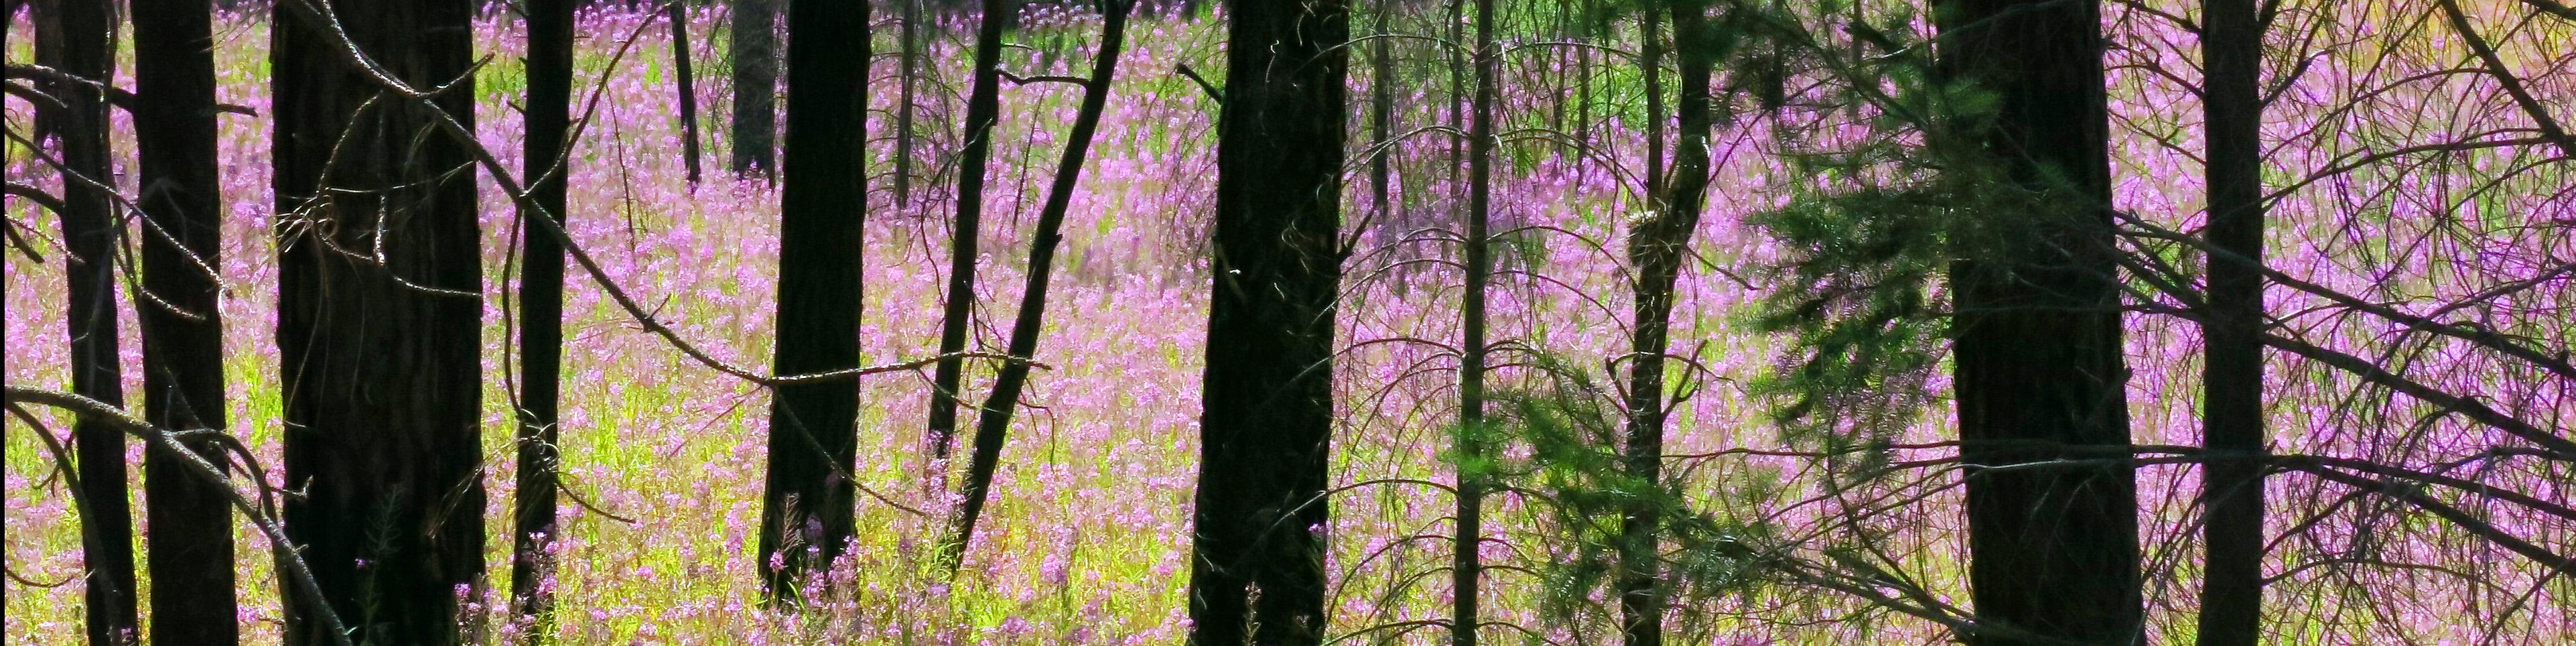 fireweed banner IMG_8555